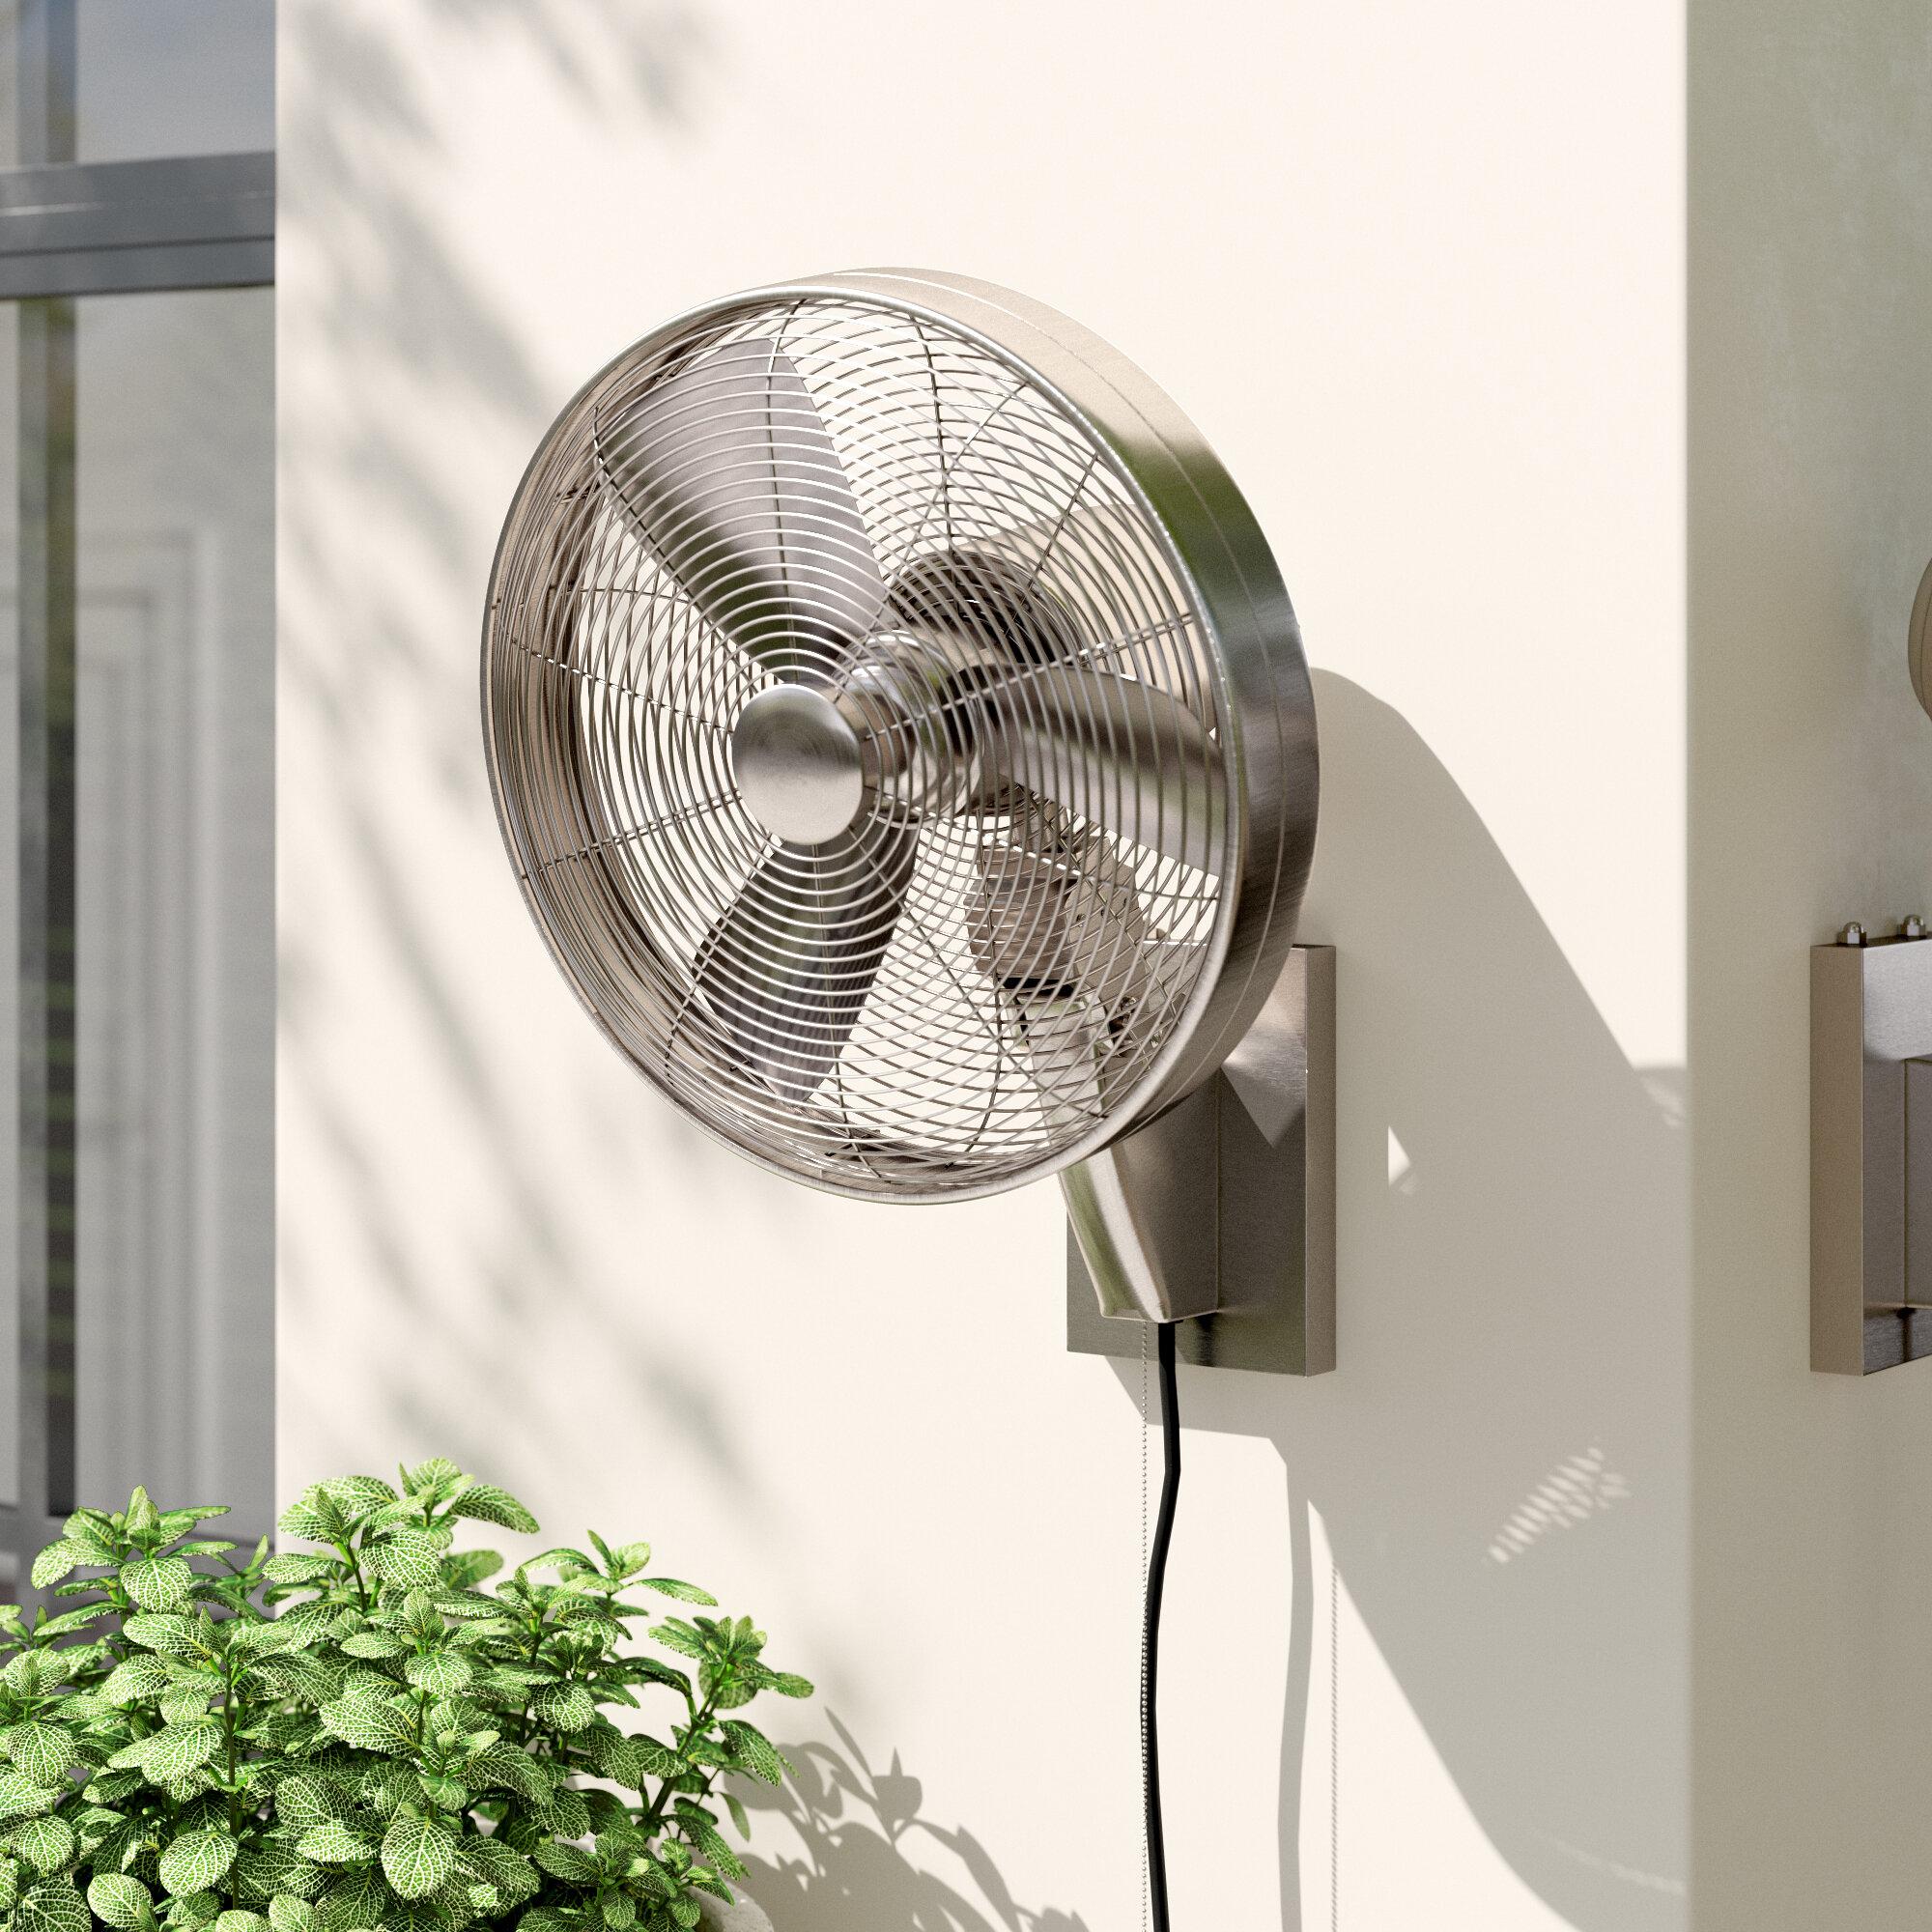 Minka Aire Anywhere 18 4 Oscillating Wall Mounted Fan Reviews Wayfair